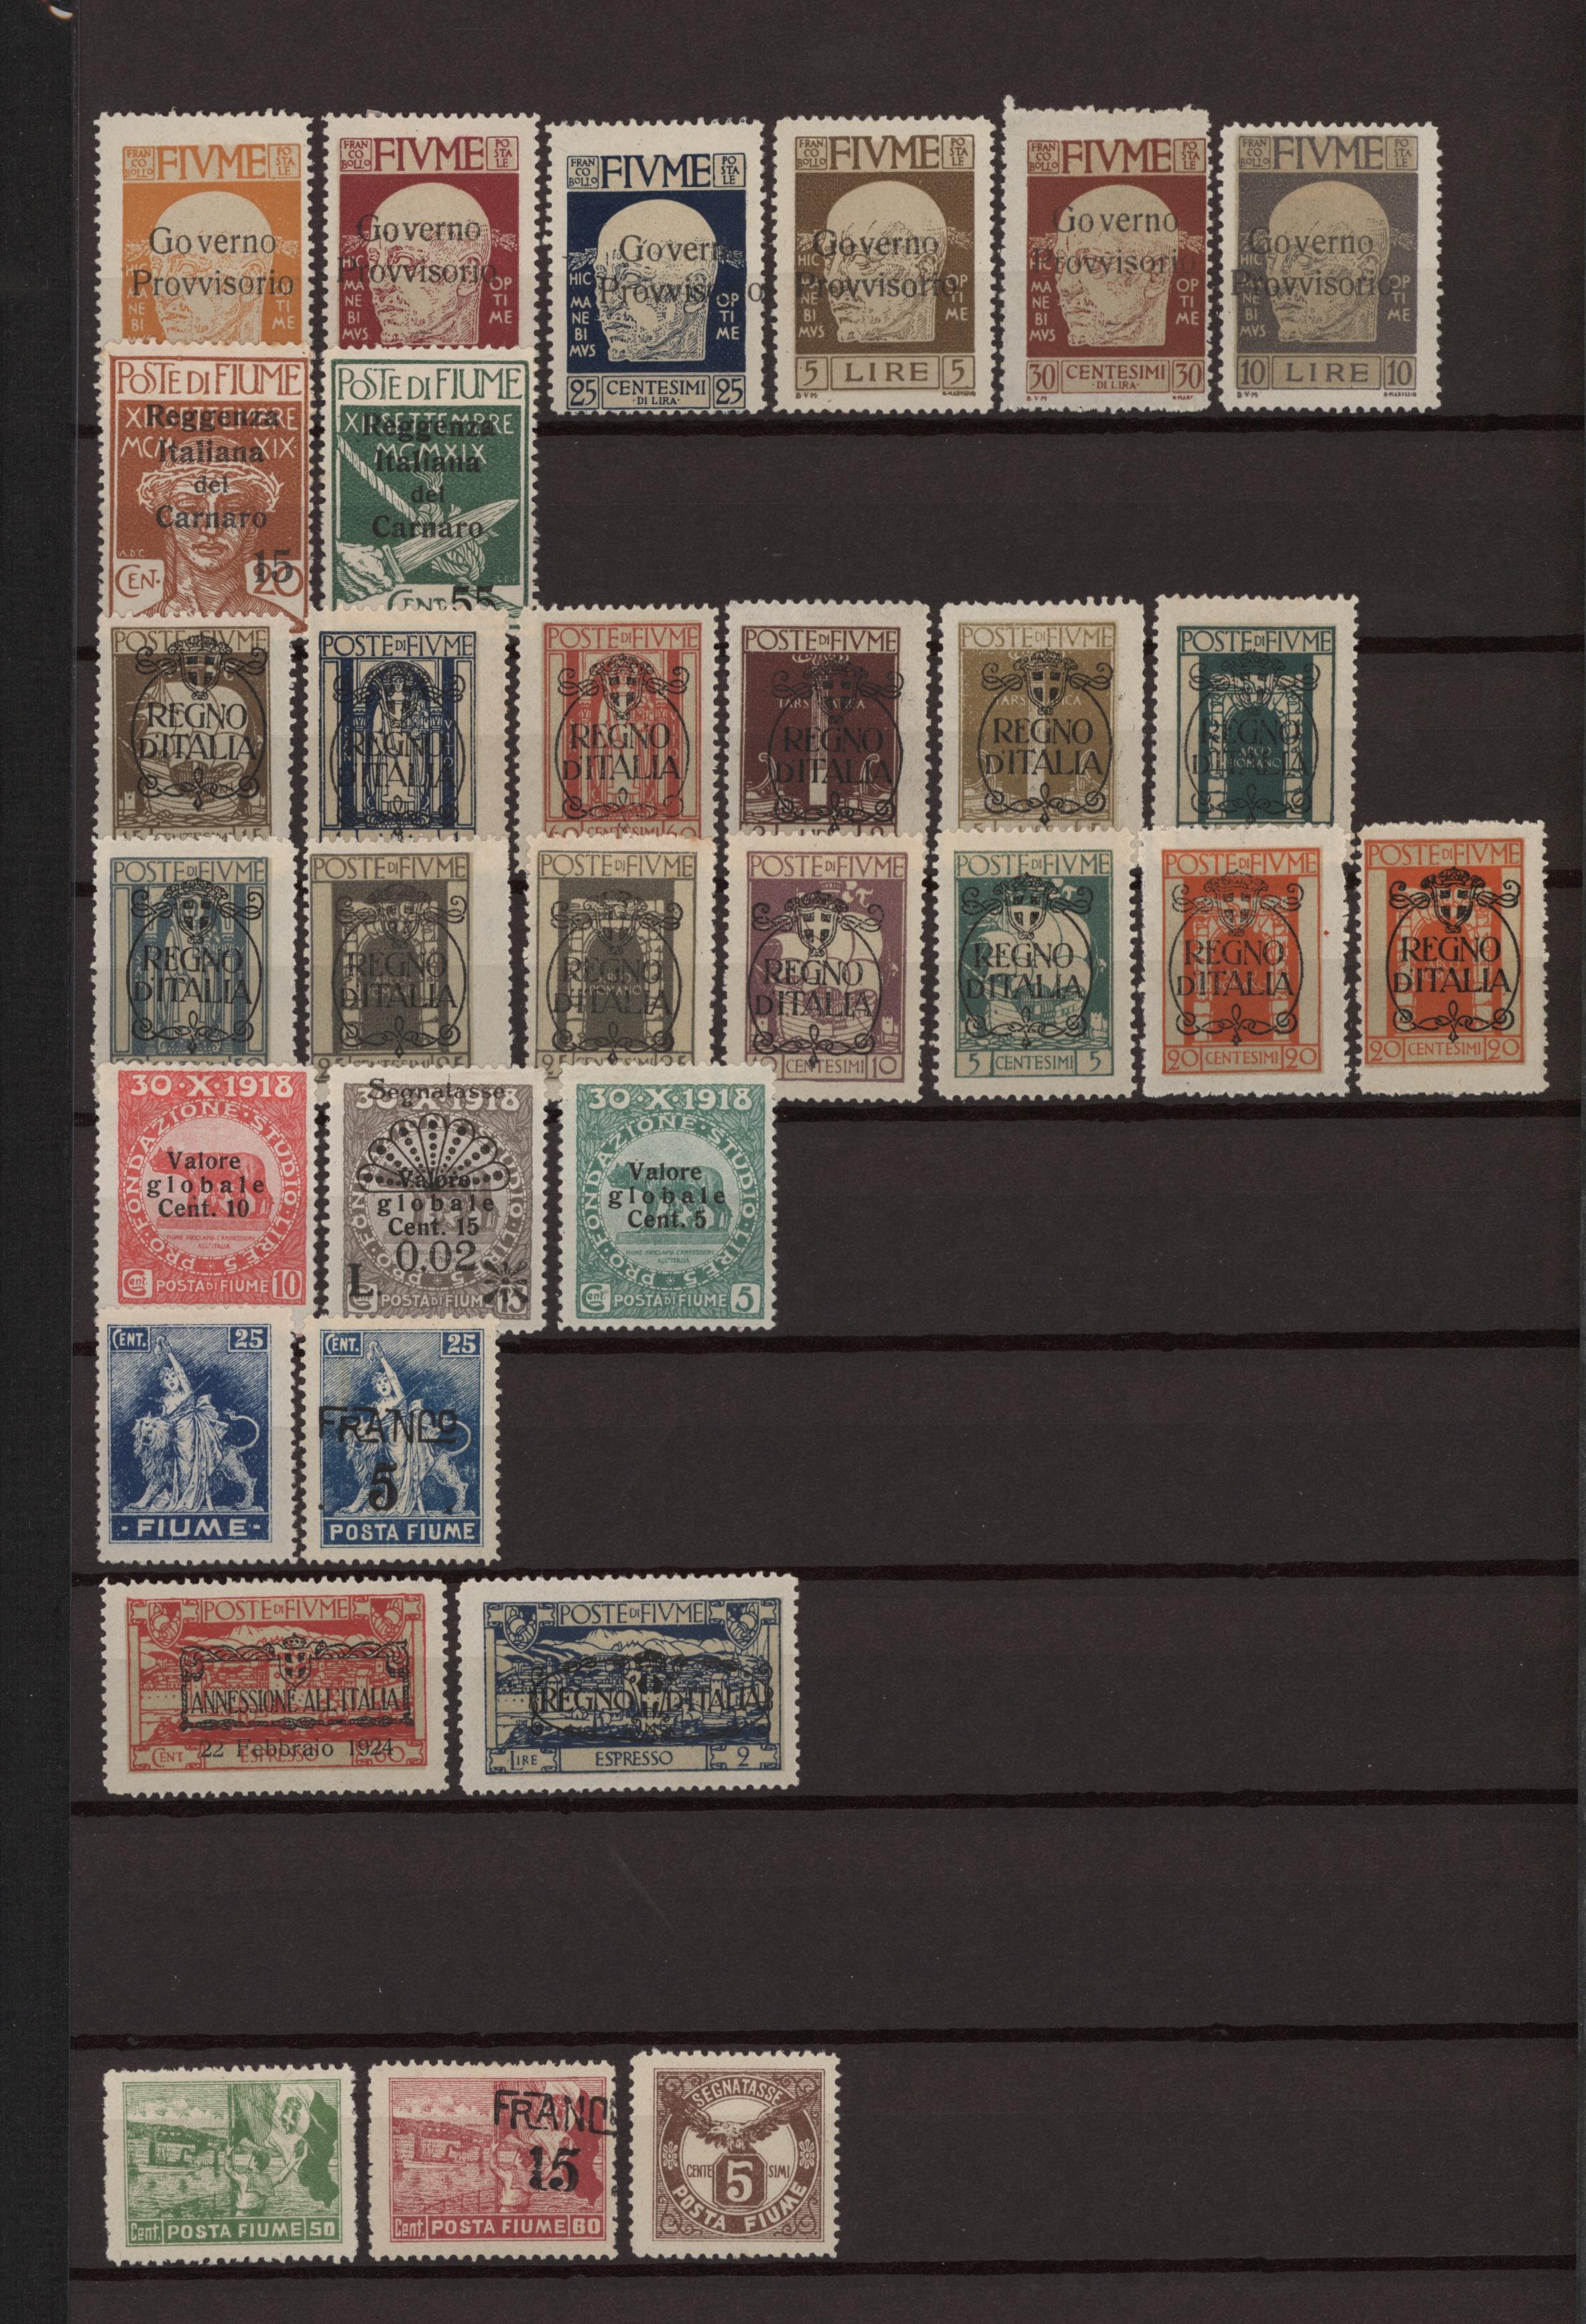 Lot 22211 - nachlässe  -  Auktionshaus Christoph Gärtner GmbH & Co. KG Sale #49 Collections Overseas, Thematics, Europe, Germany/Estates